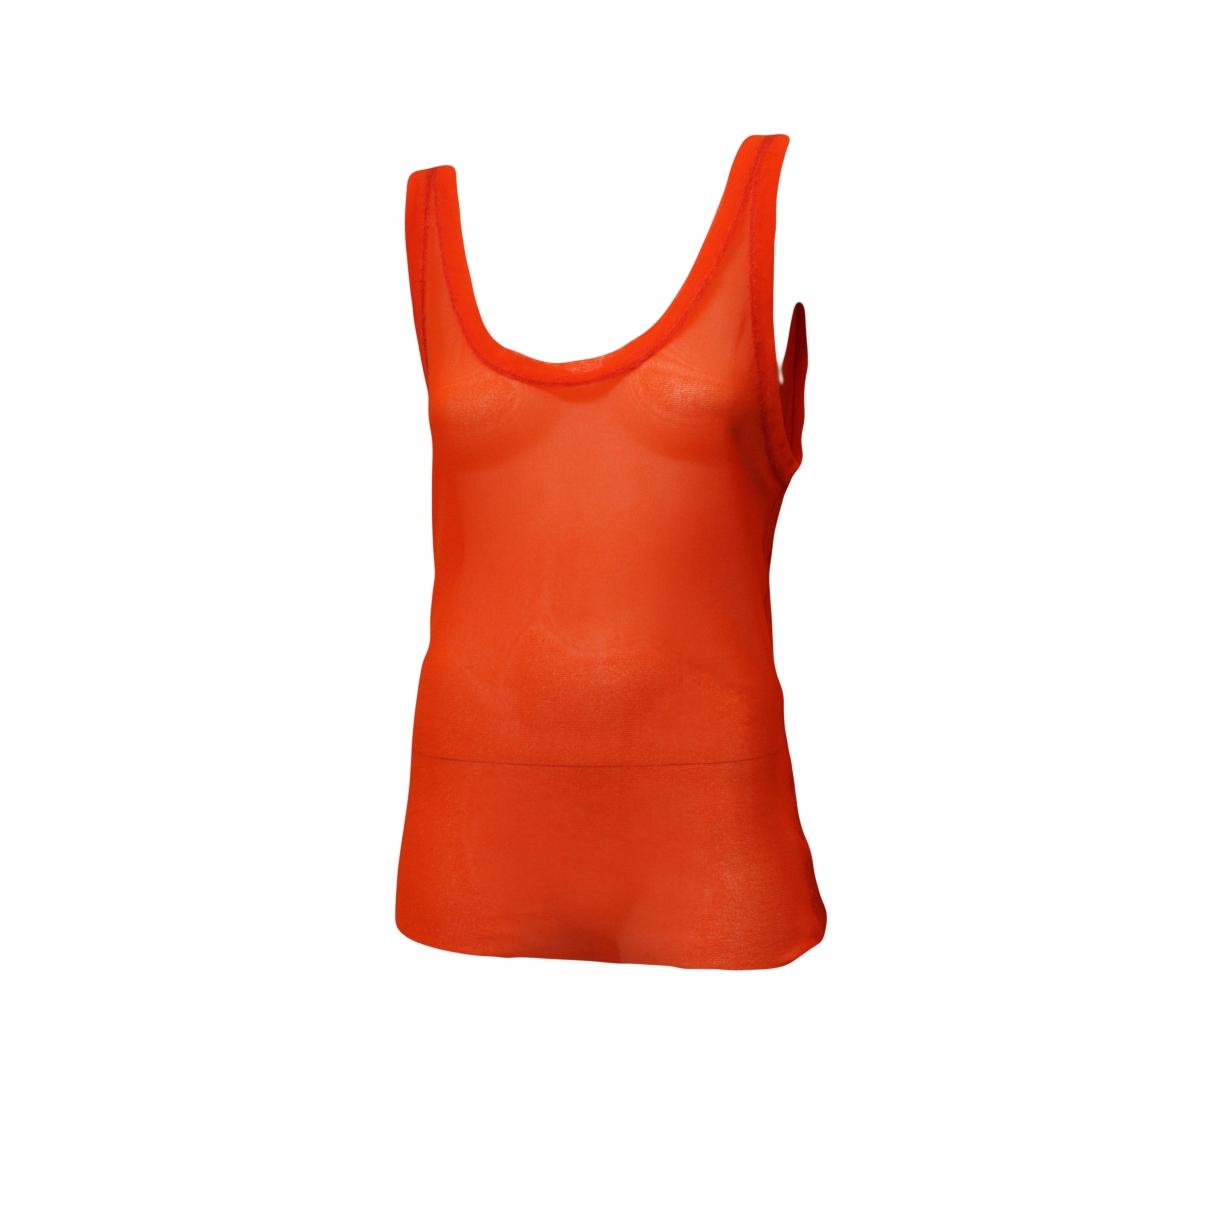 Jean Paul Gaultier - Top   pour femme - orange